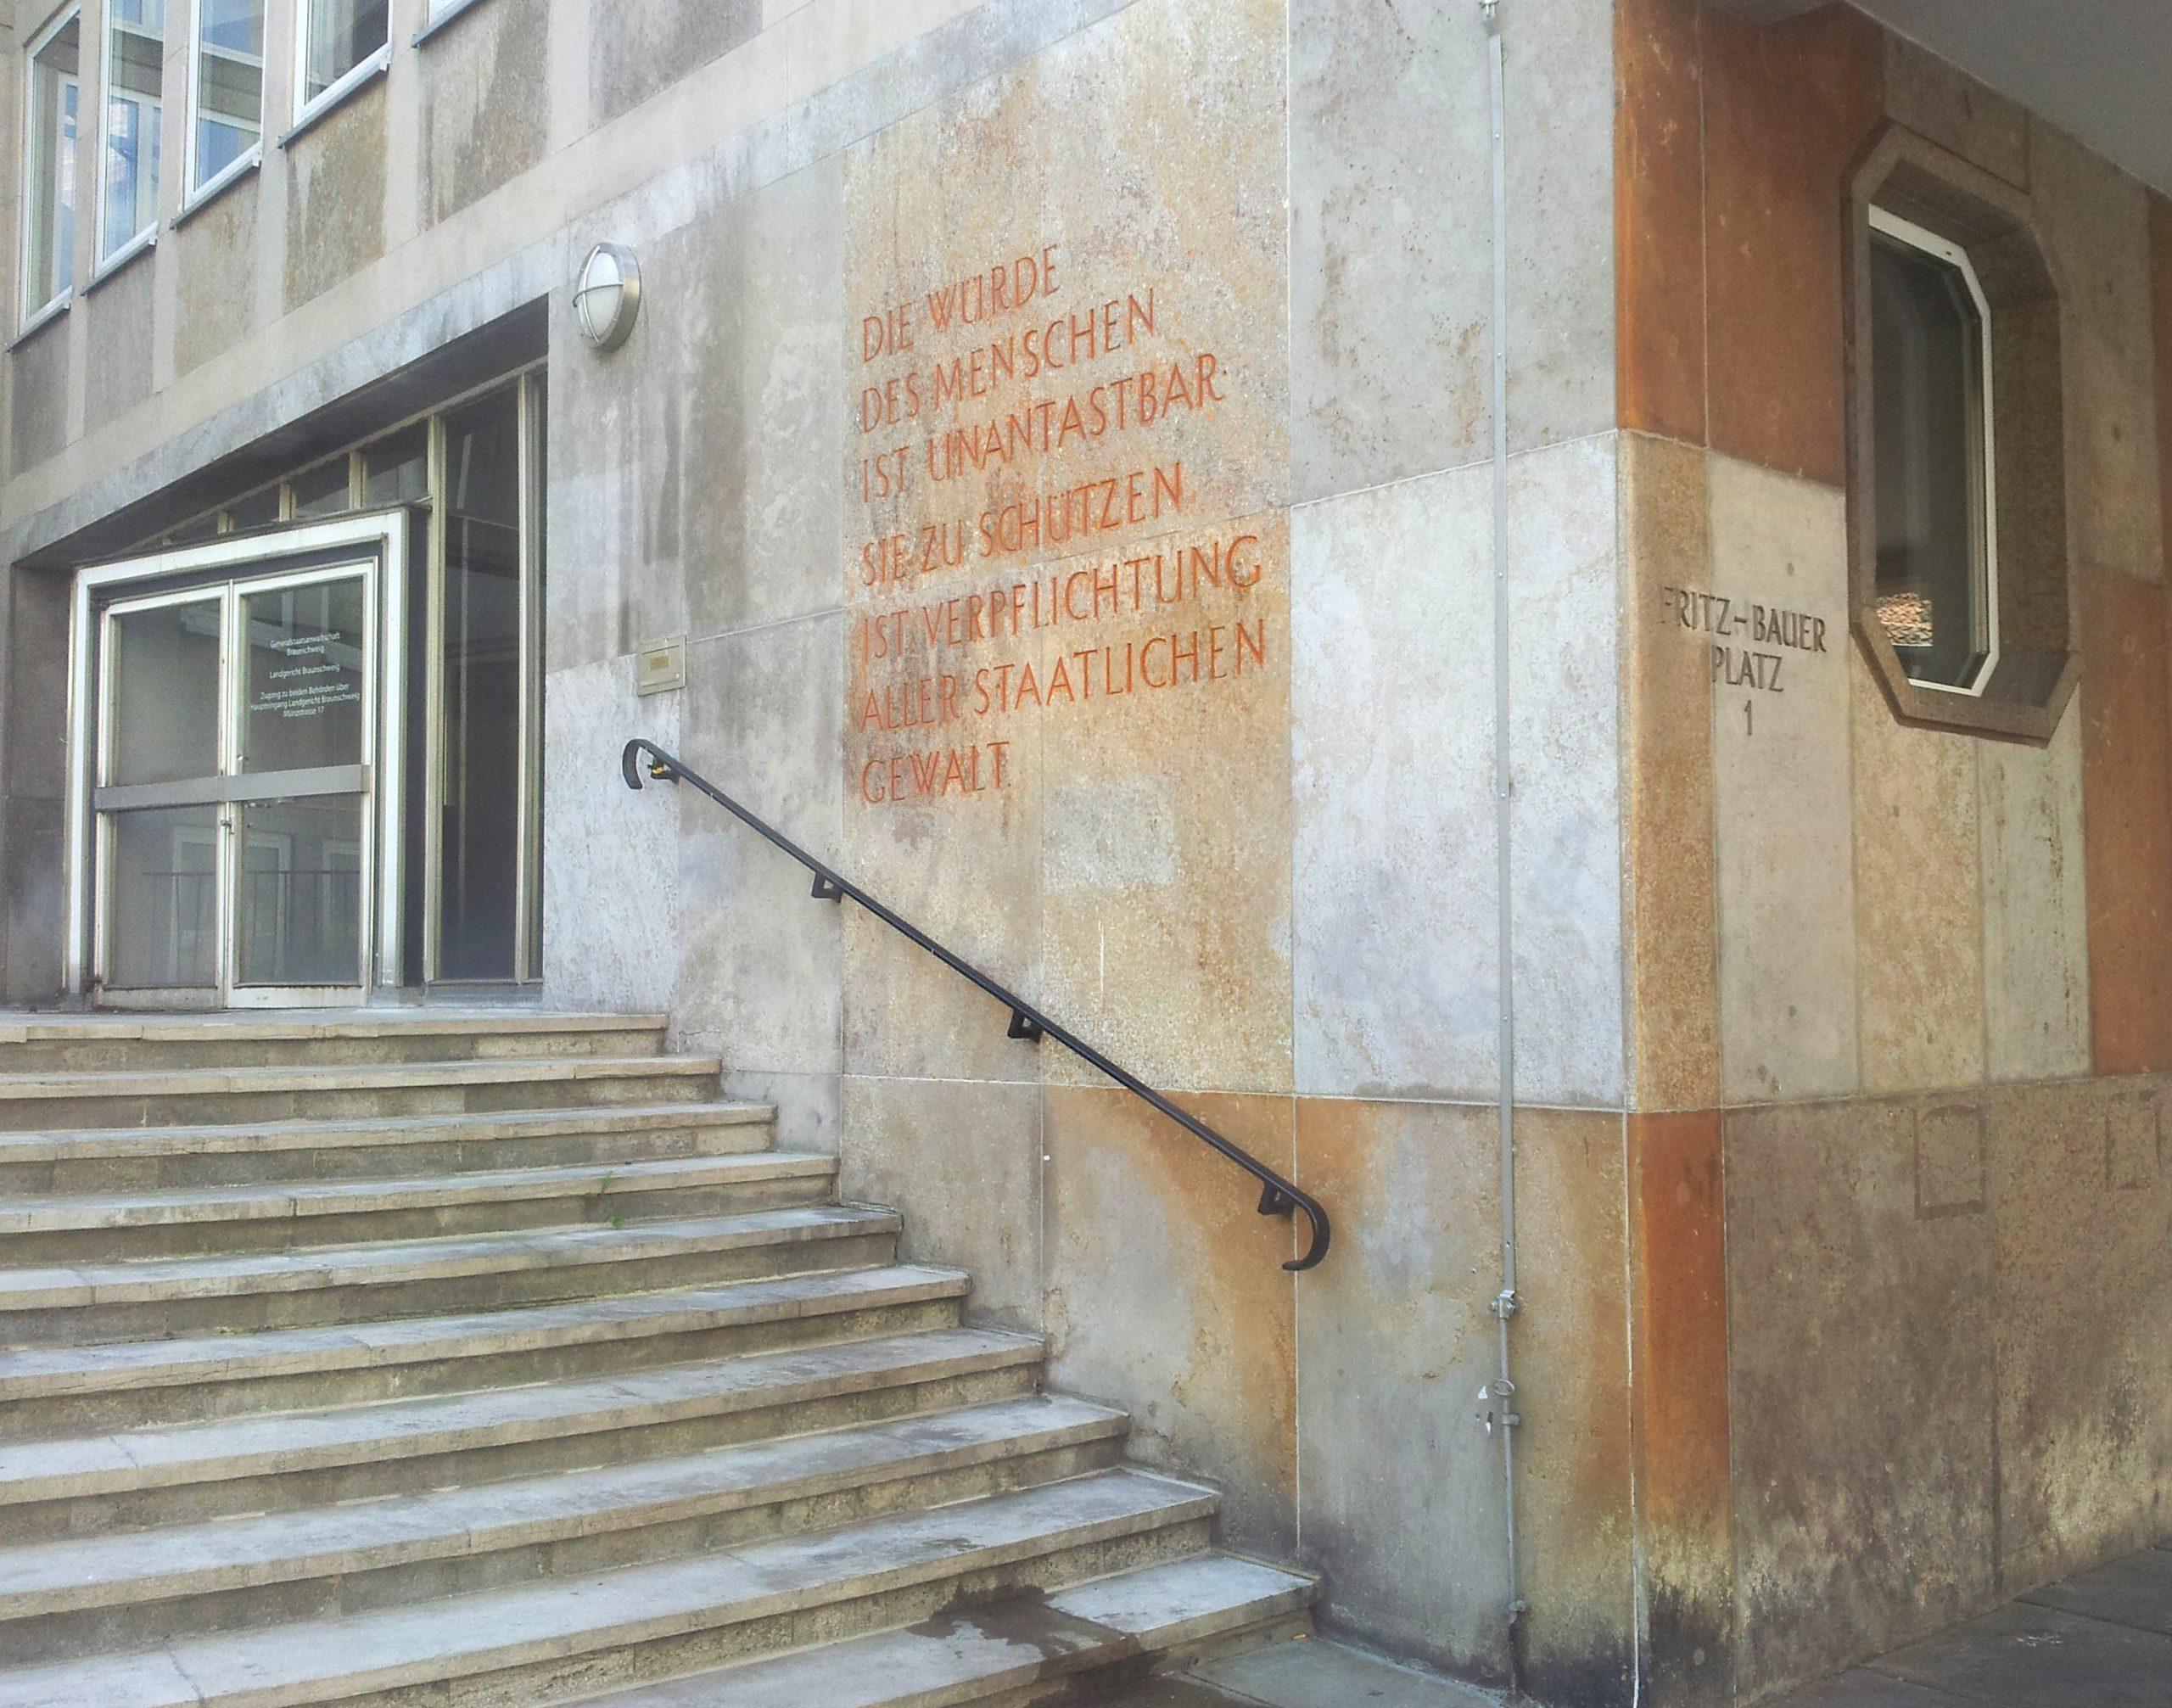 Generalstaatsanwaltschaft Braunschweig